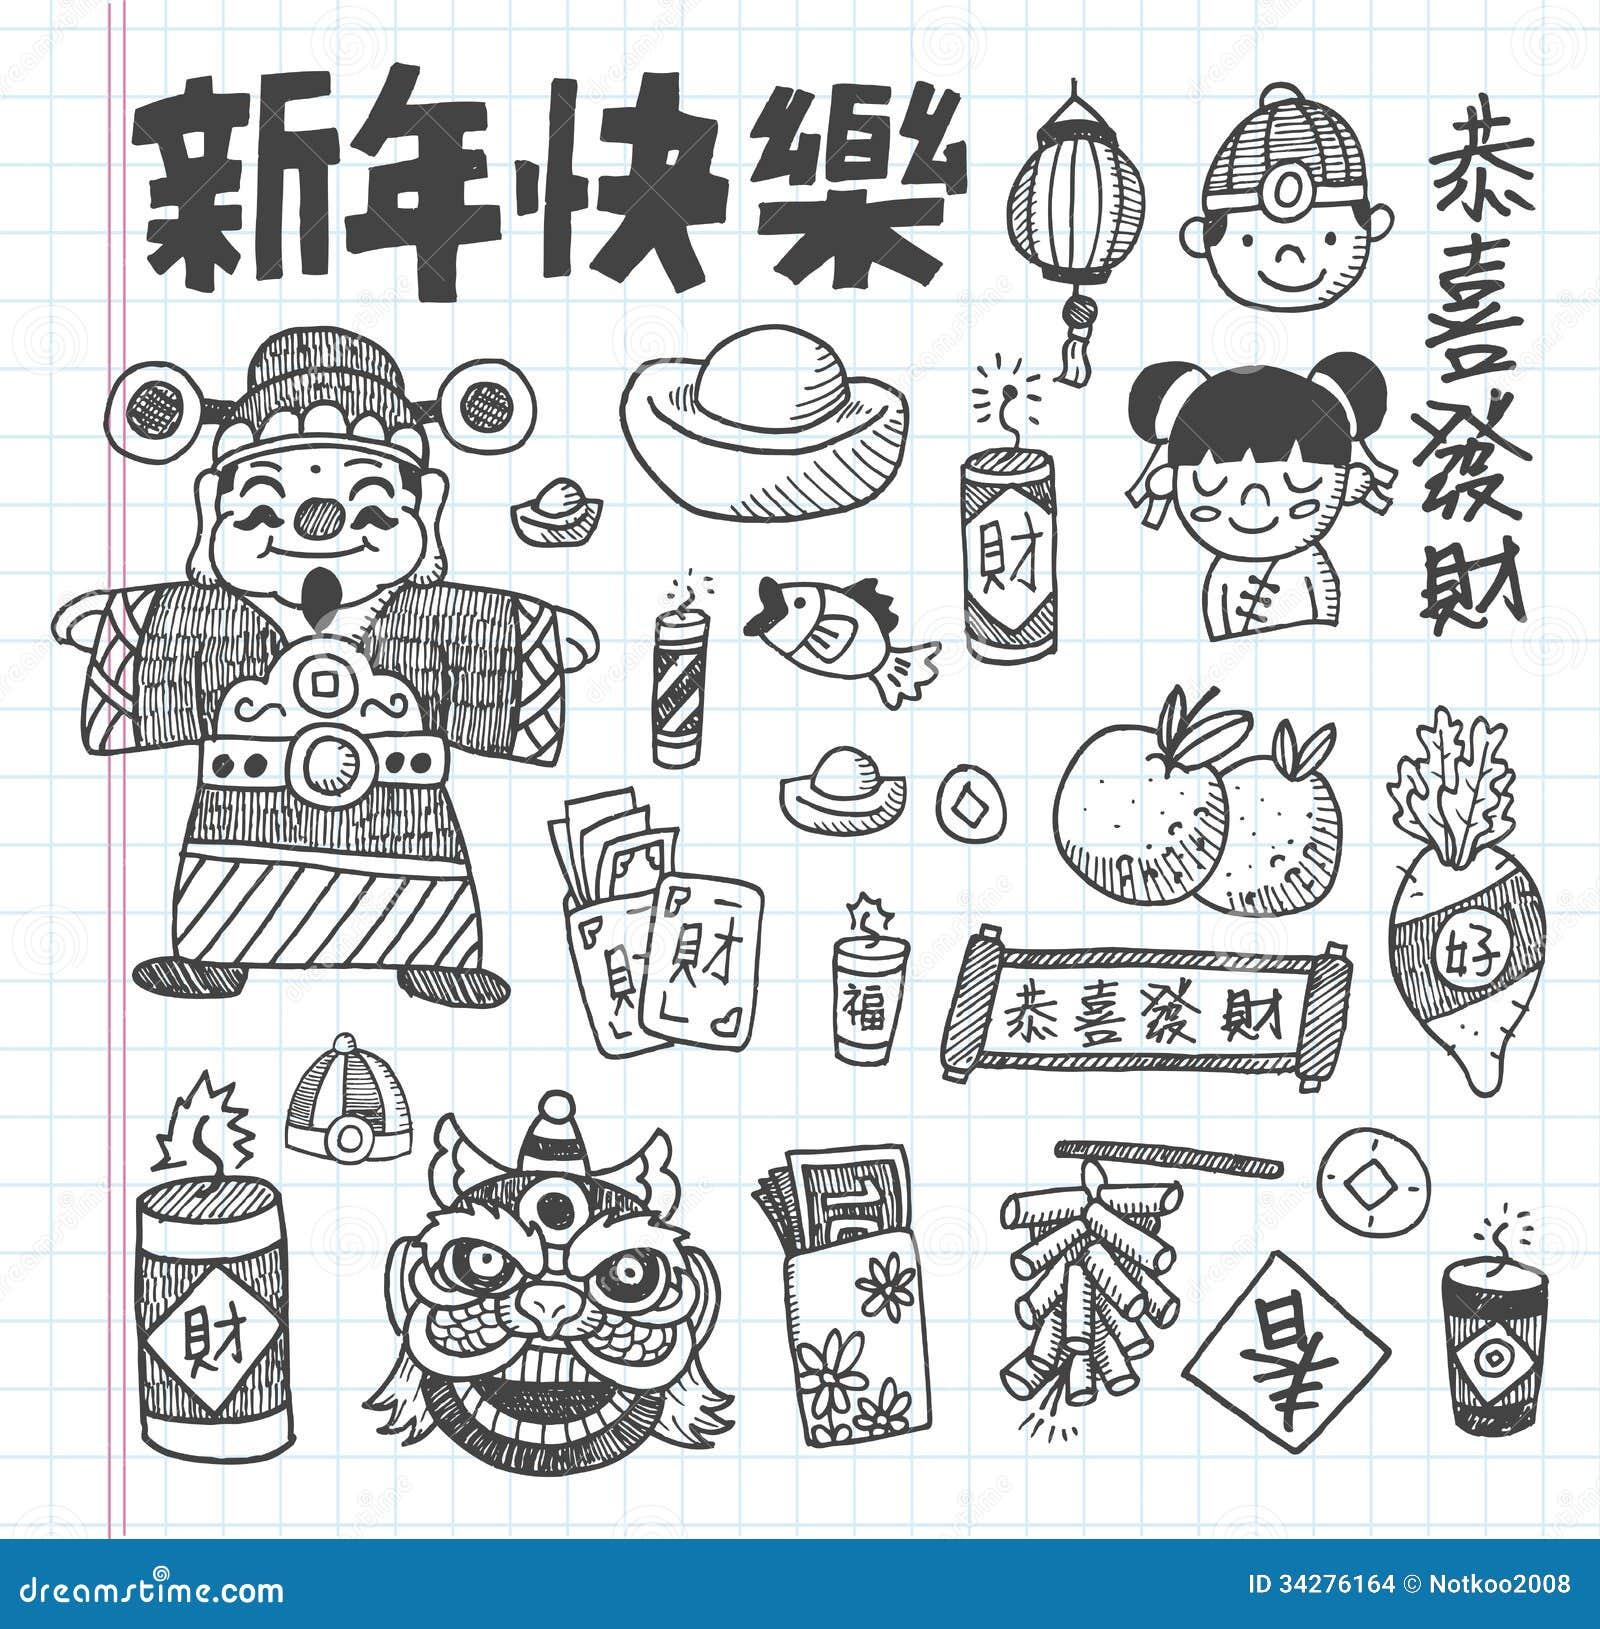 Doodle Chinese New Year Icons Set Stock Images Image 34276164